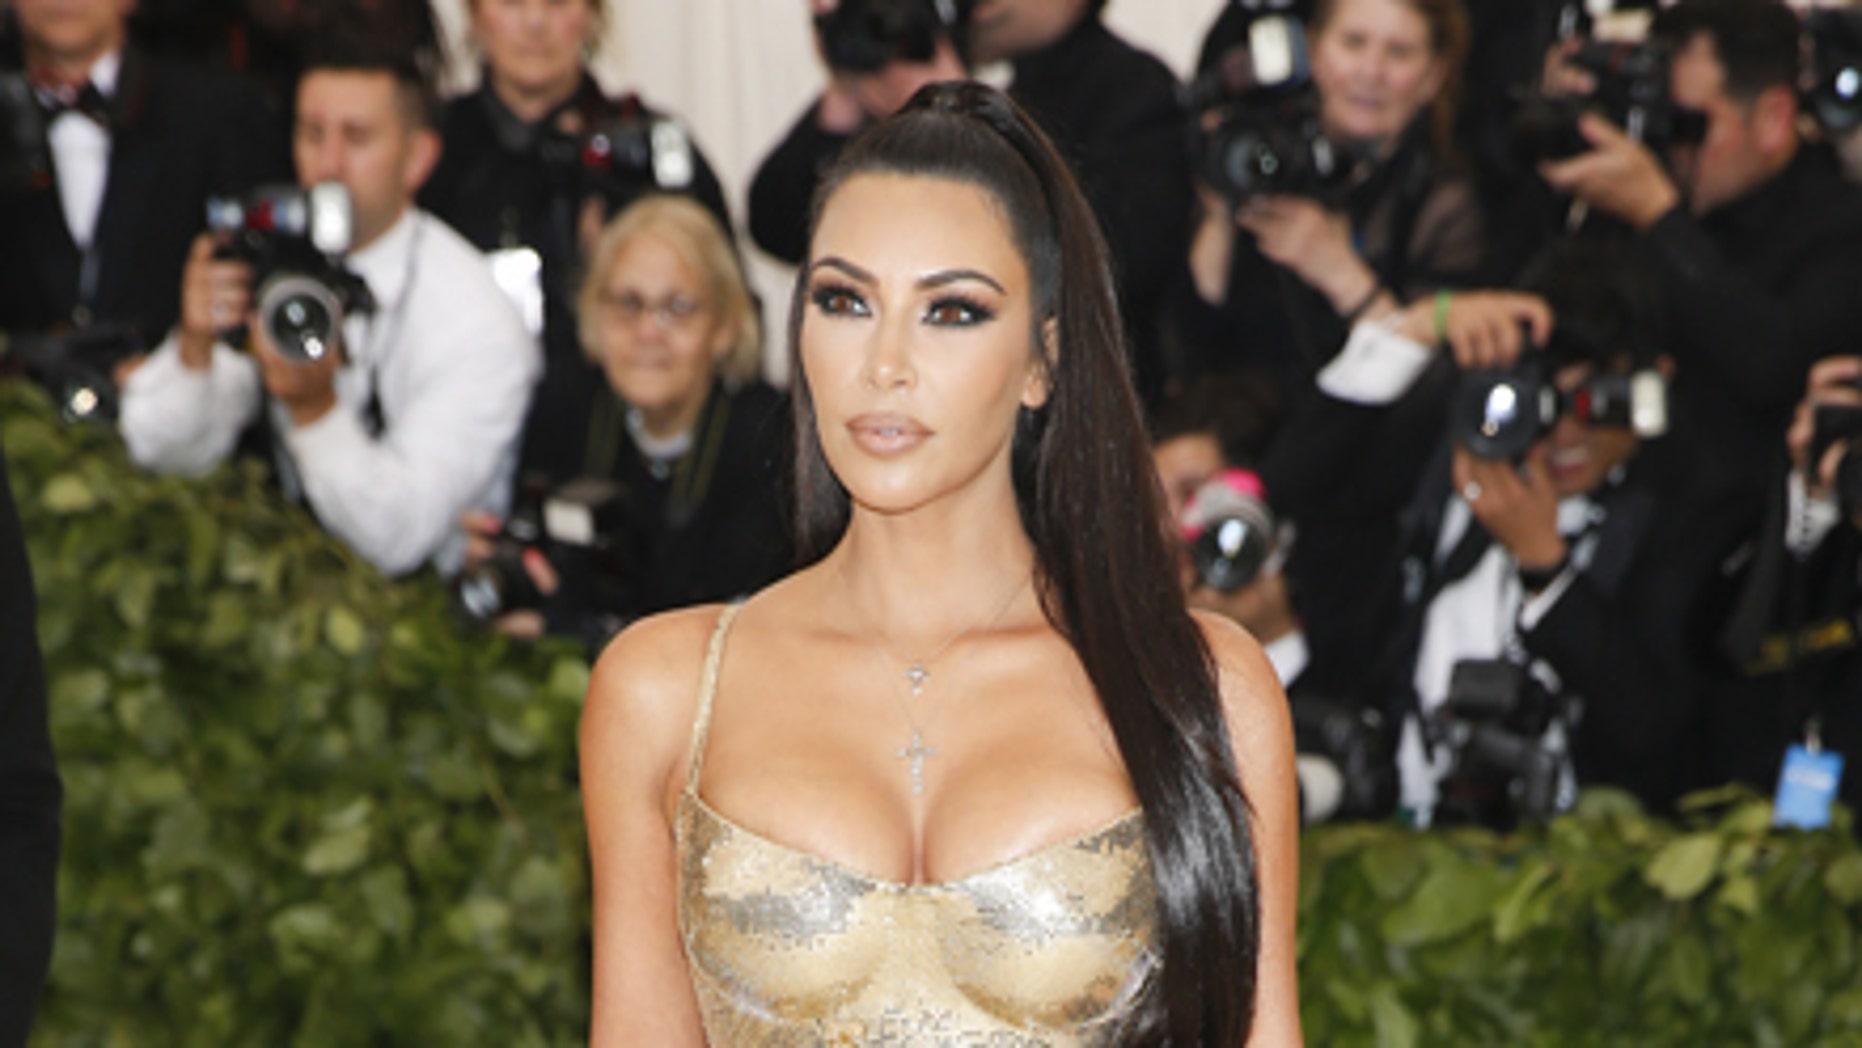 Kim Kardashian poses sans Kanye West at the Metropolitan Museum of Art Costume Institute Gala.